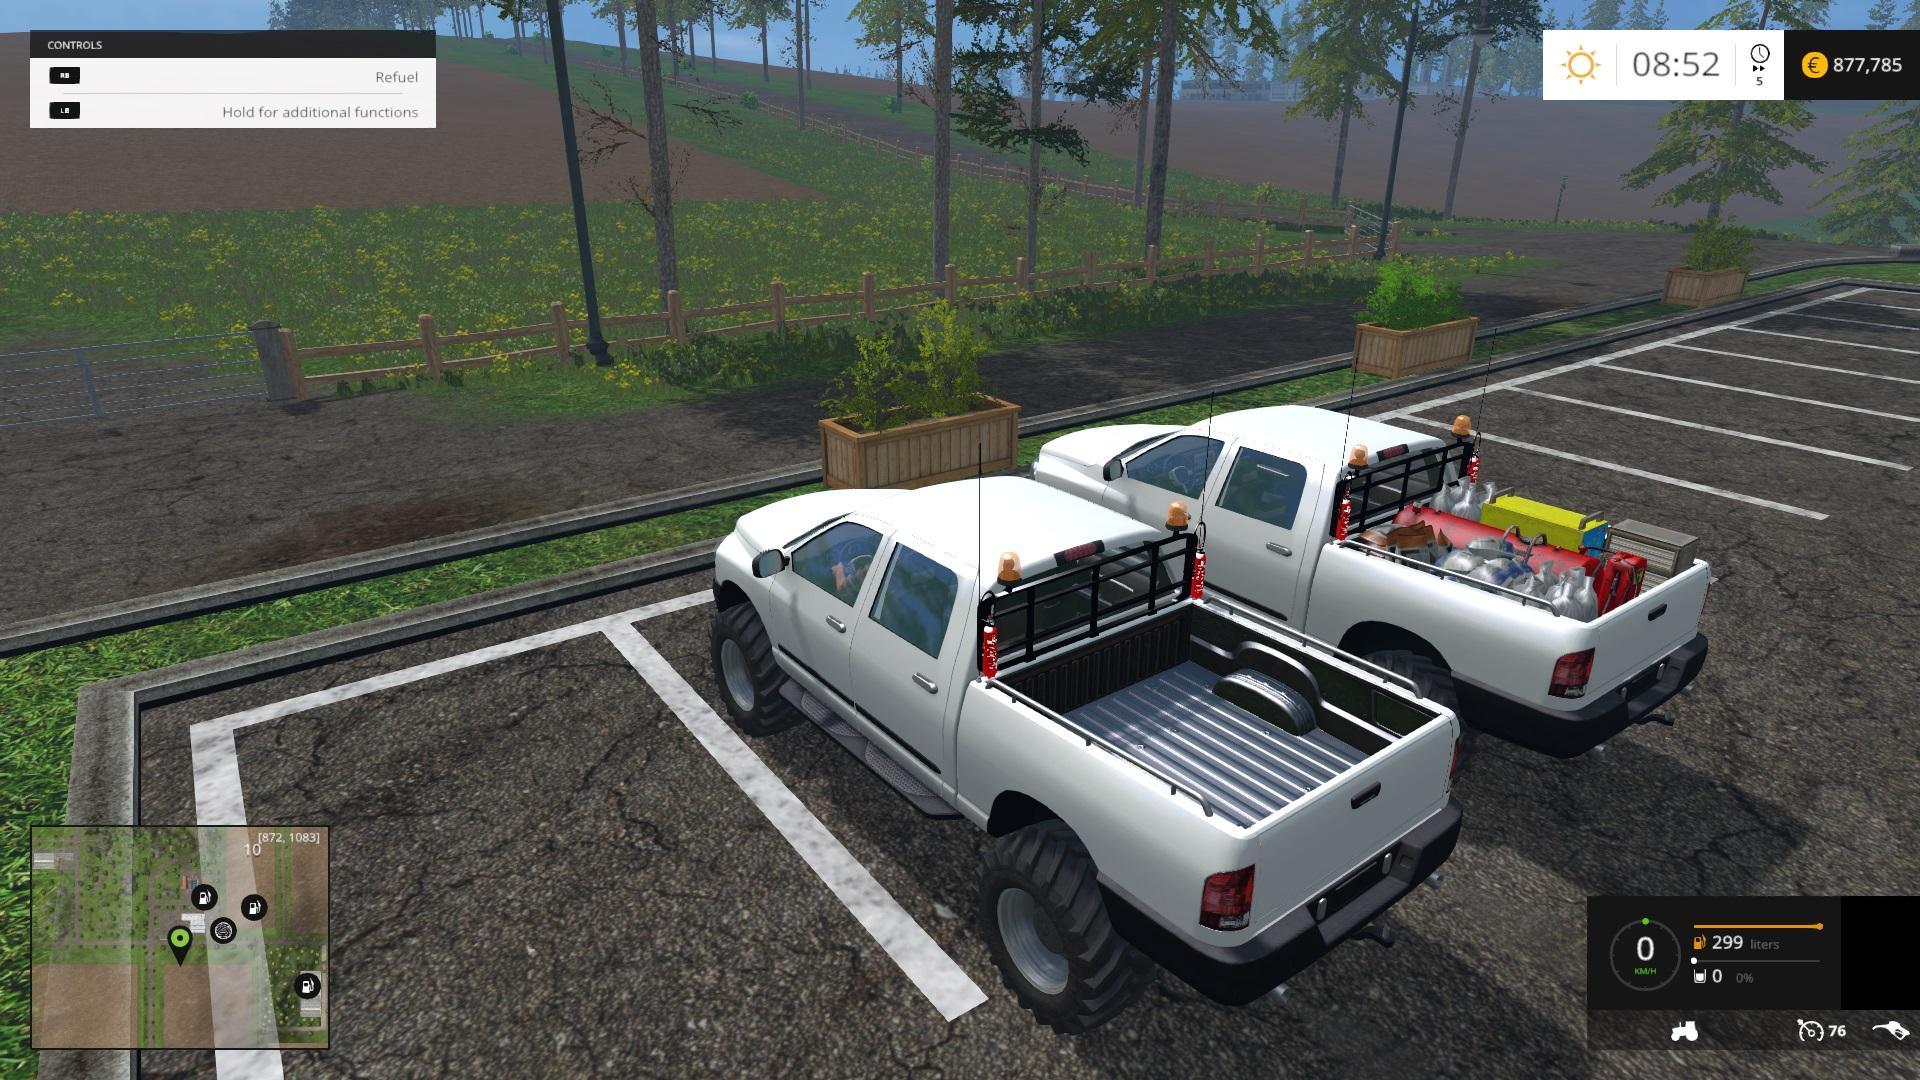 AND STANDARD PICKUP CAR V1.1 - Farming simulator 2015 / 15 LS mod